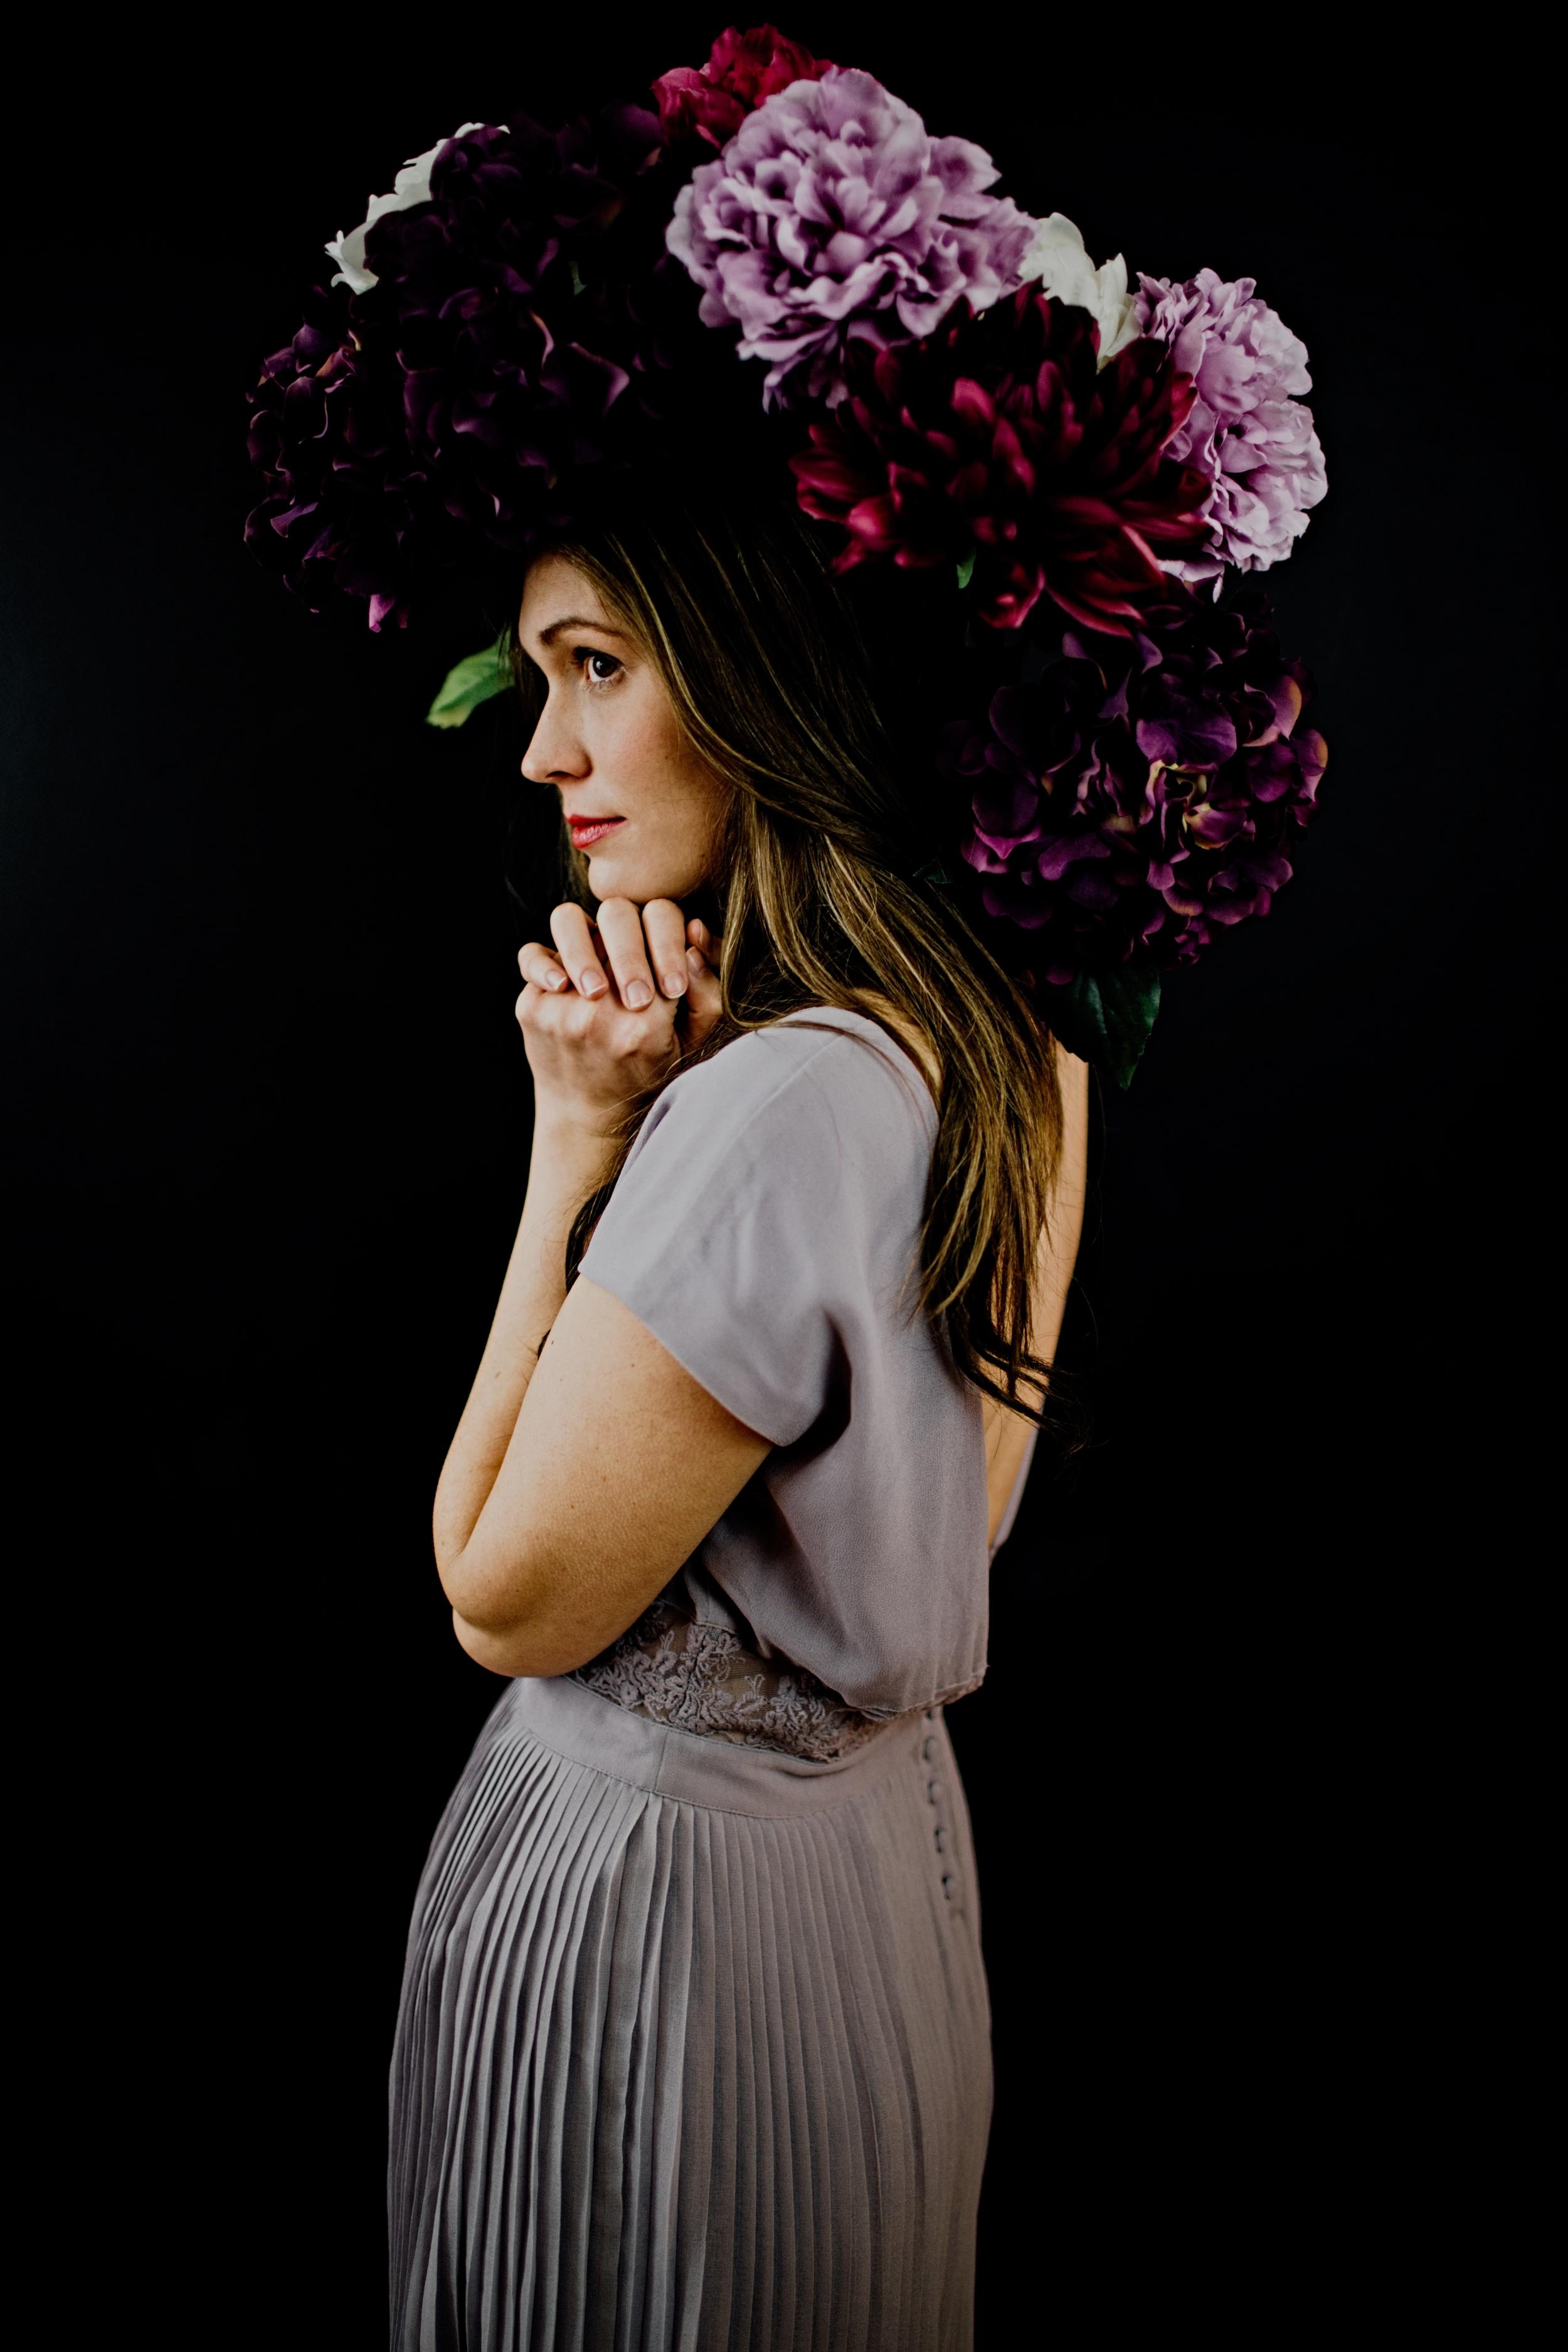 JennaFlowers2 (42 of 45)-Exposure.jpg